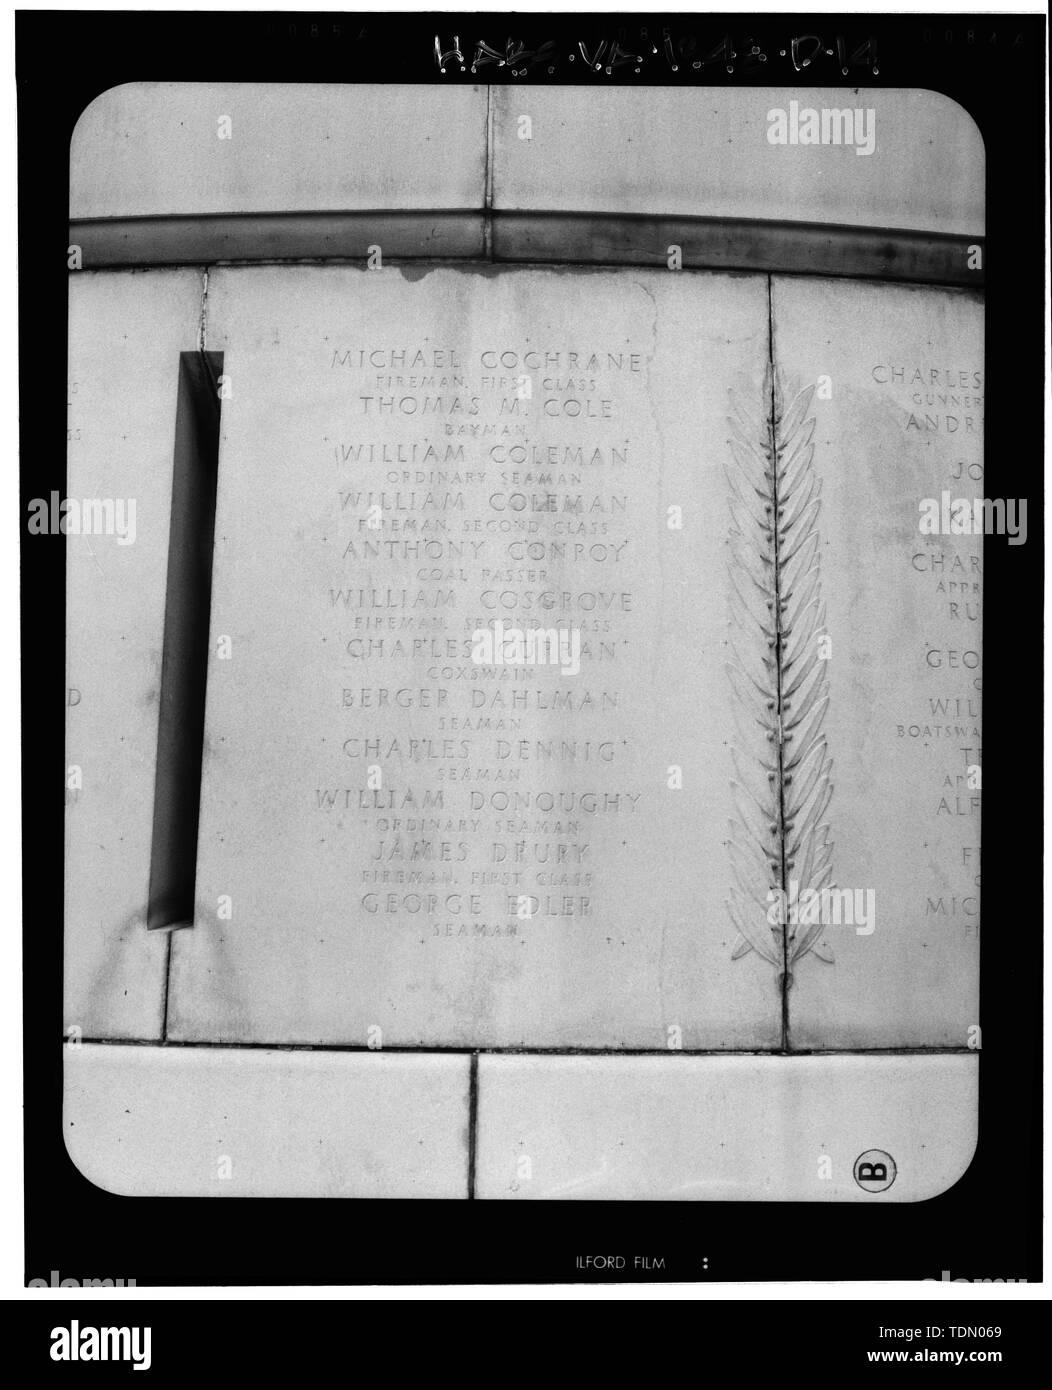 Panel 4 - Arlington National Cemetery, USS Maine Memorial, Arlington, Arlington County, VA; U.S. Army Corps of Engineers; Wyeth, Nathan C; Black, William M; Patrick, Mason M; Ferguson, H B; Bixby, W H; Goodson, W F; Lackawanna Steel Company; T.L. Huston Construction Company; Harris Brothers; Clark, D Lombillo; Primelles, Arturo; Rhodes, D H; Jenkins, Oliver B; Tilford, James D; Aleshire, J B; Stimson, H E; Scofield, John J; Hugh, R P; Houston, J B; Sharpe, Henry G; Downey, G F; Clem, L; Cosby, Spencer; Taft, William Howard; Commission of Fine Arts; Olmsted, Fredrick Law; French, Daniel Chester - Stock Image